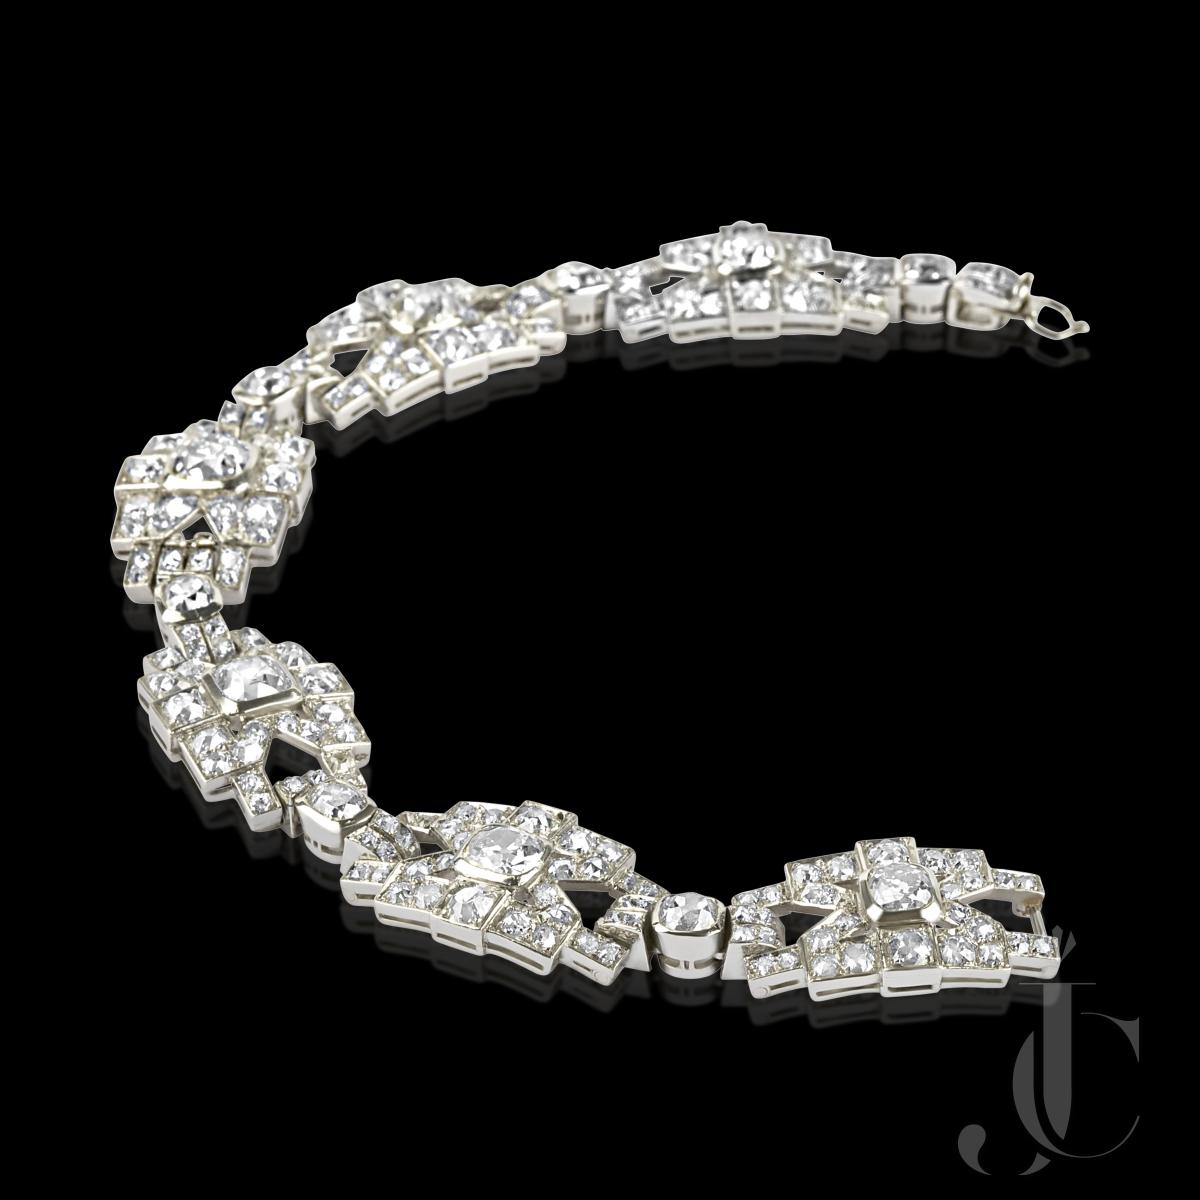 White Gold & Old Cut Diamond Bracelet